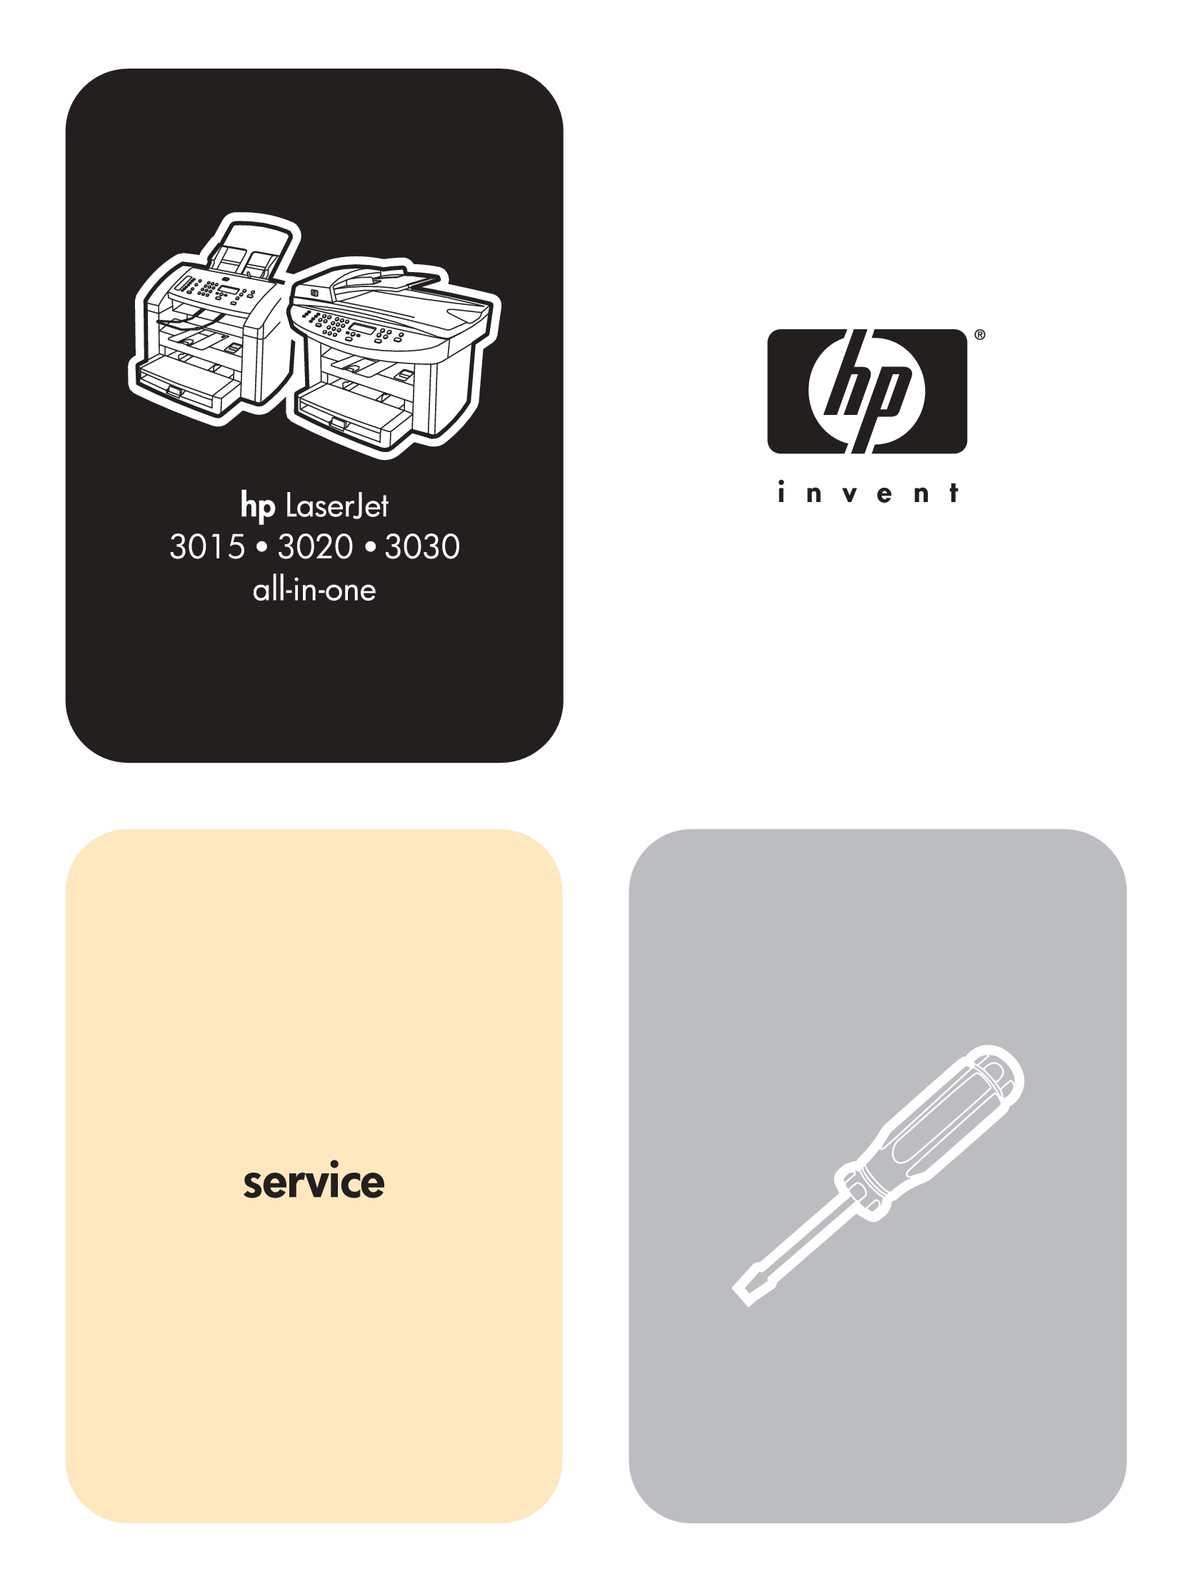 Harga Jual Hp 410x Ylw Contract Lj Toner Cartridge Update 2018 Biji Bubuk Kopi Betina Koffie Warung Tinggi Premium Blended Coffee 500 Gram Calamo Service Manual 3015